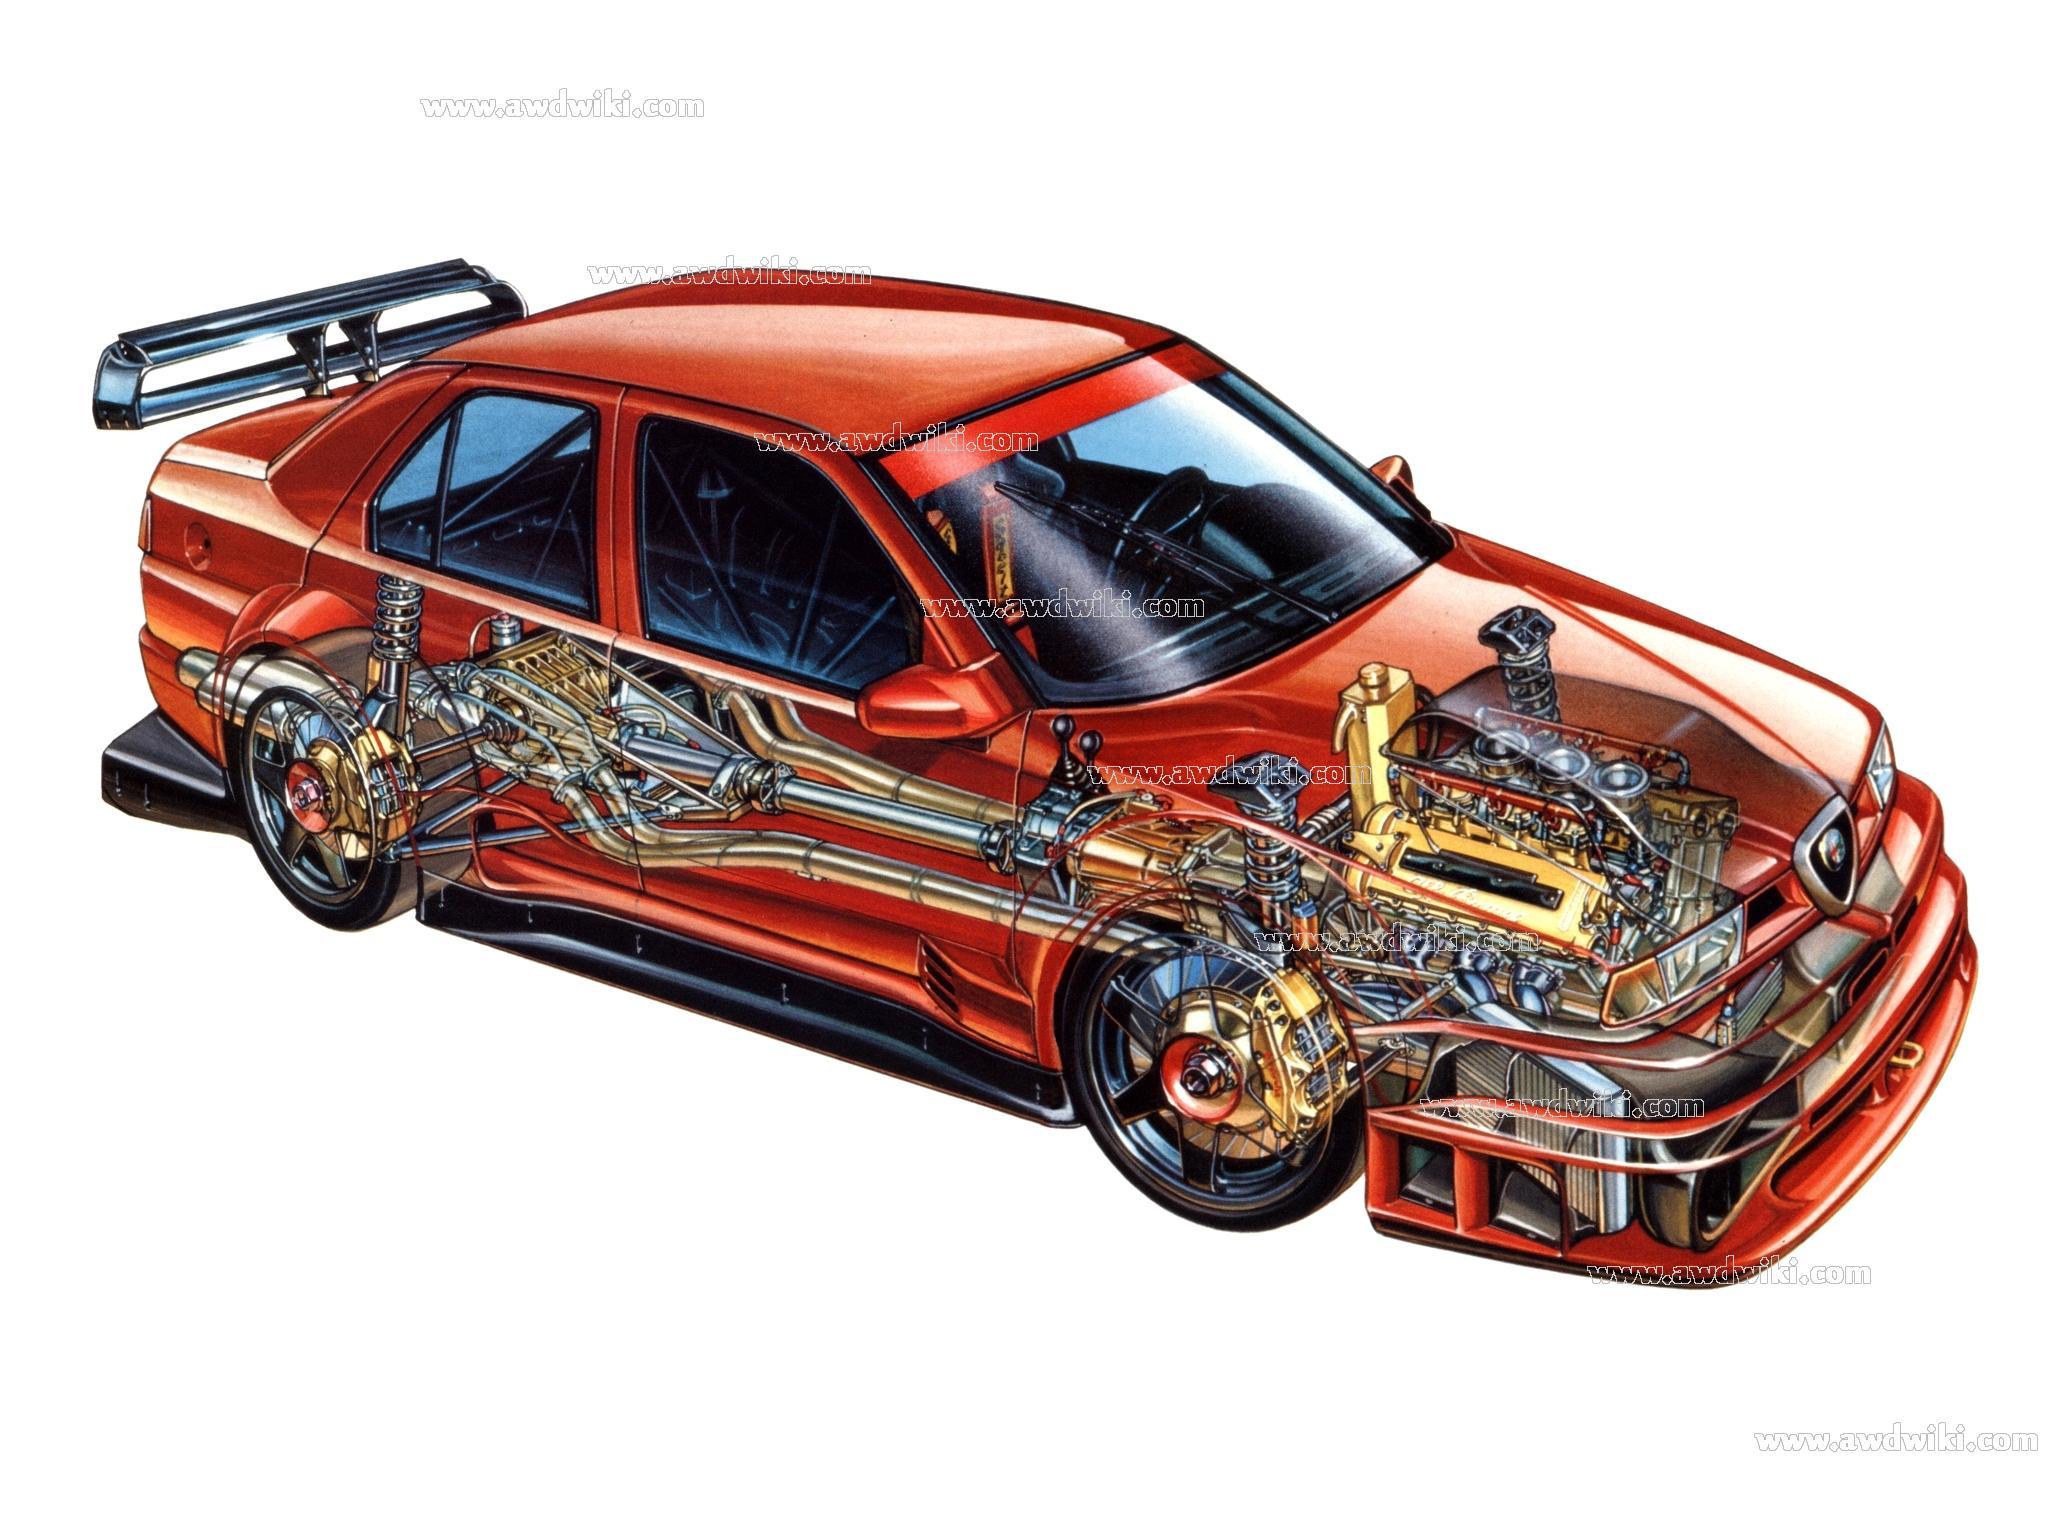 Alfa Romeo All Wheel Drive Explained Awd Cars 4x4 Vehicles 4wd Transmission Diagrams 155 Dtm 2